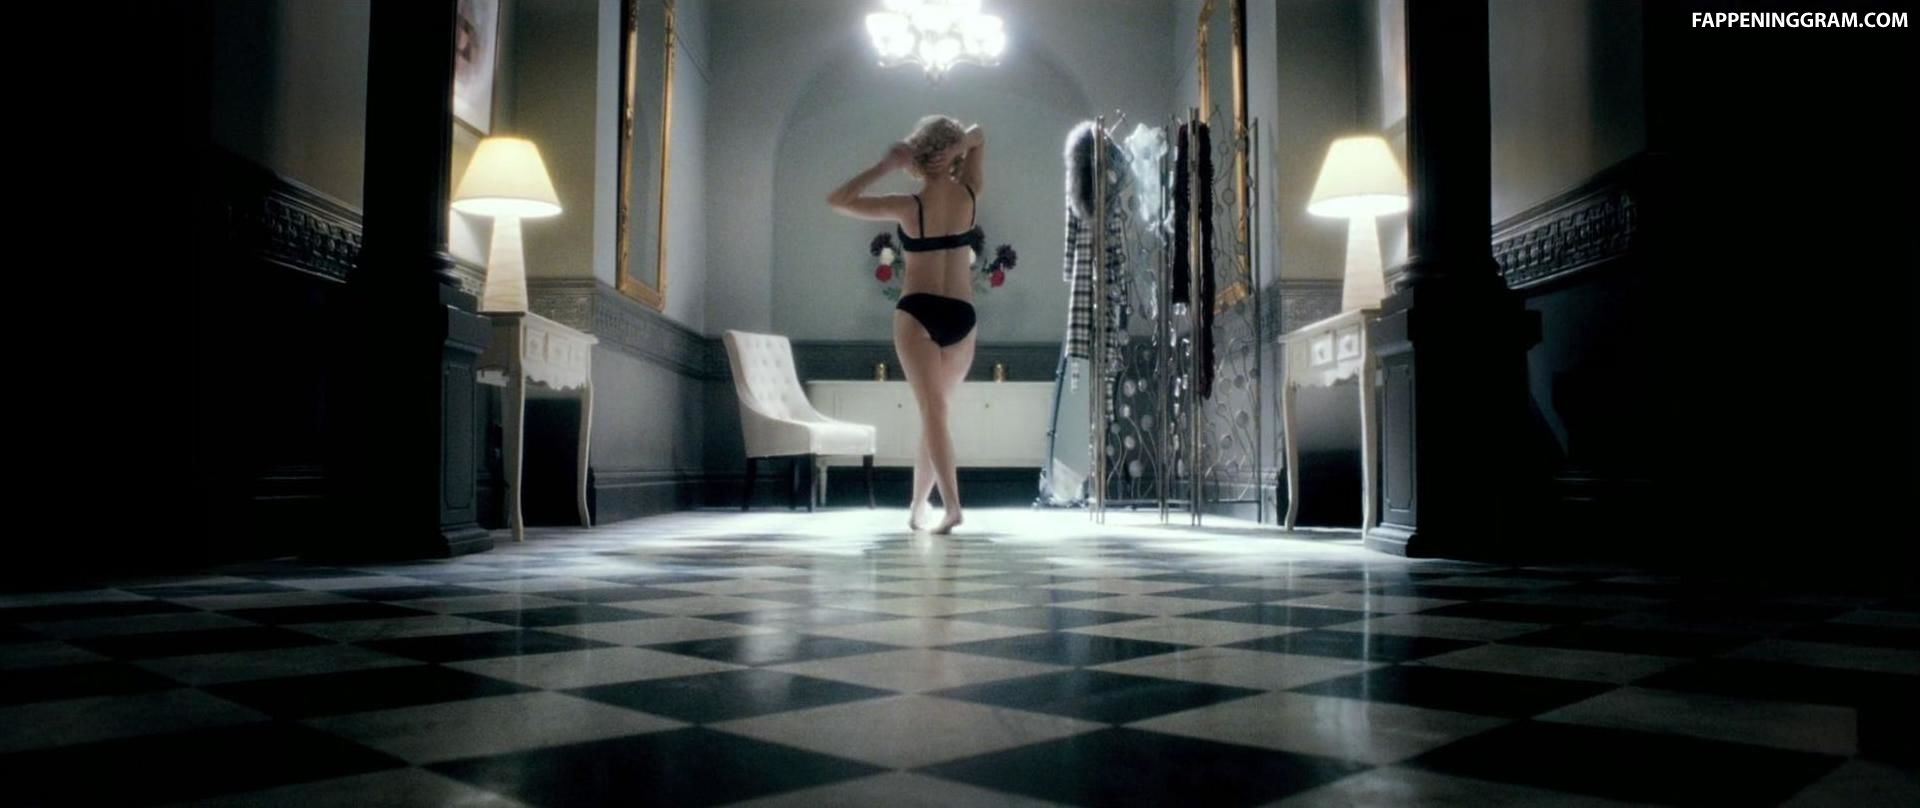 Nude shauna macdonald Hottest The